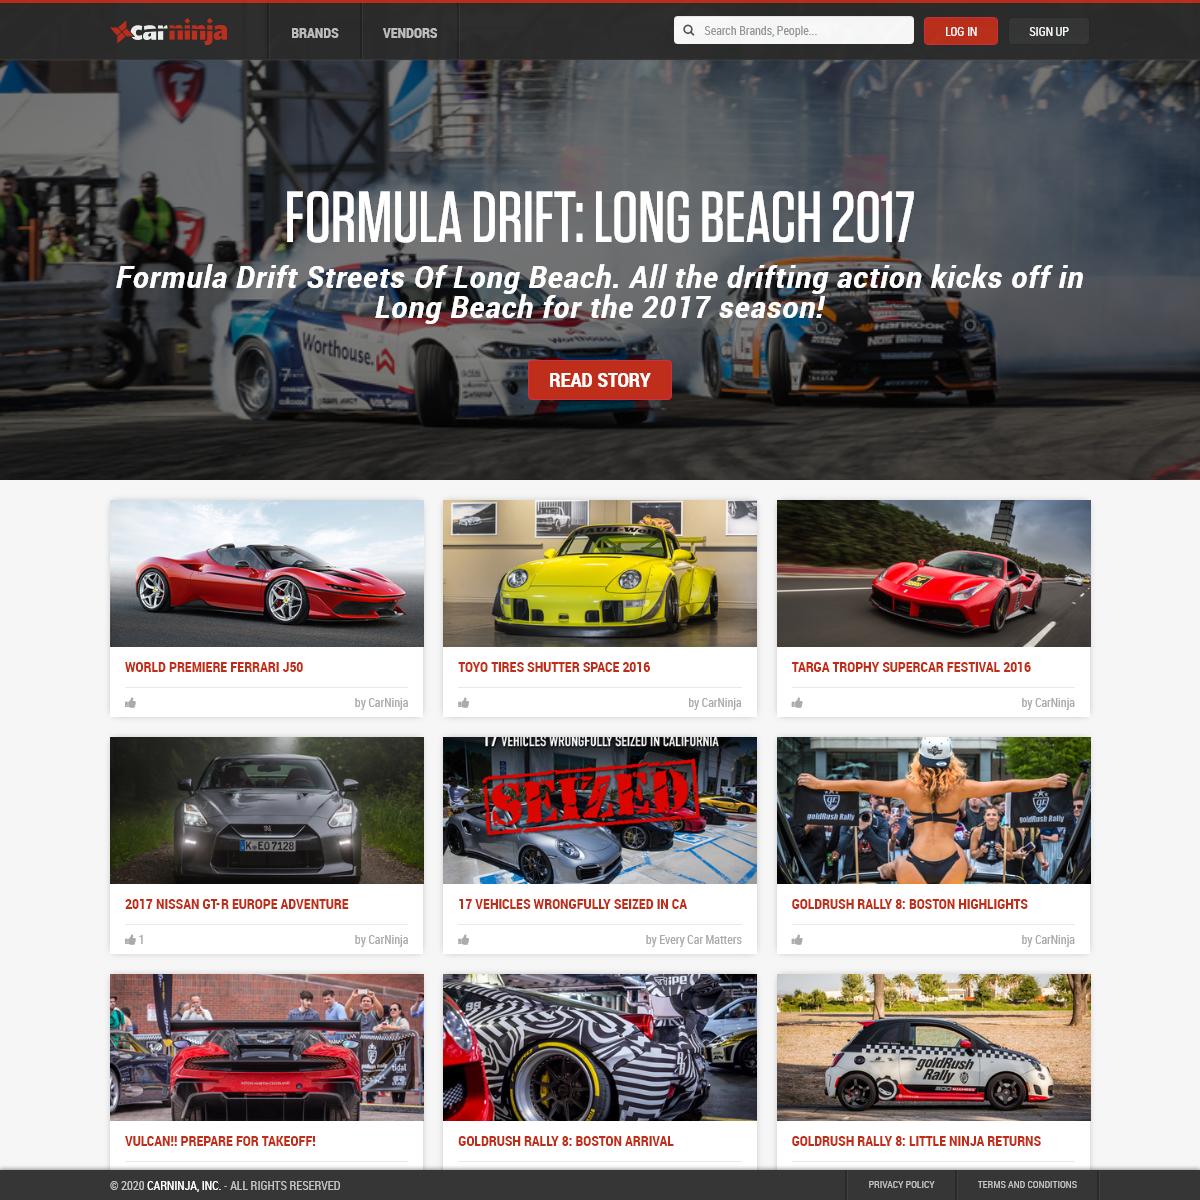 A complete backup of carninja.com